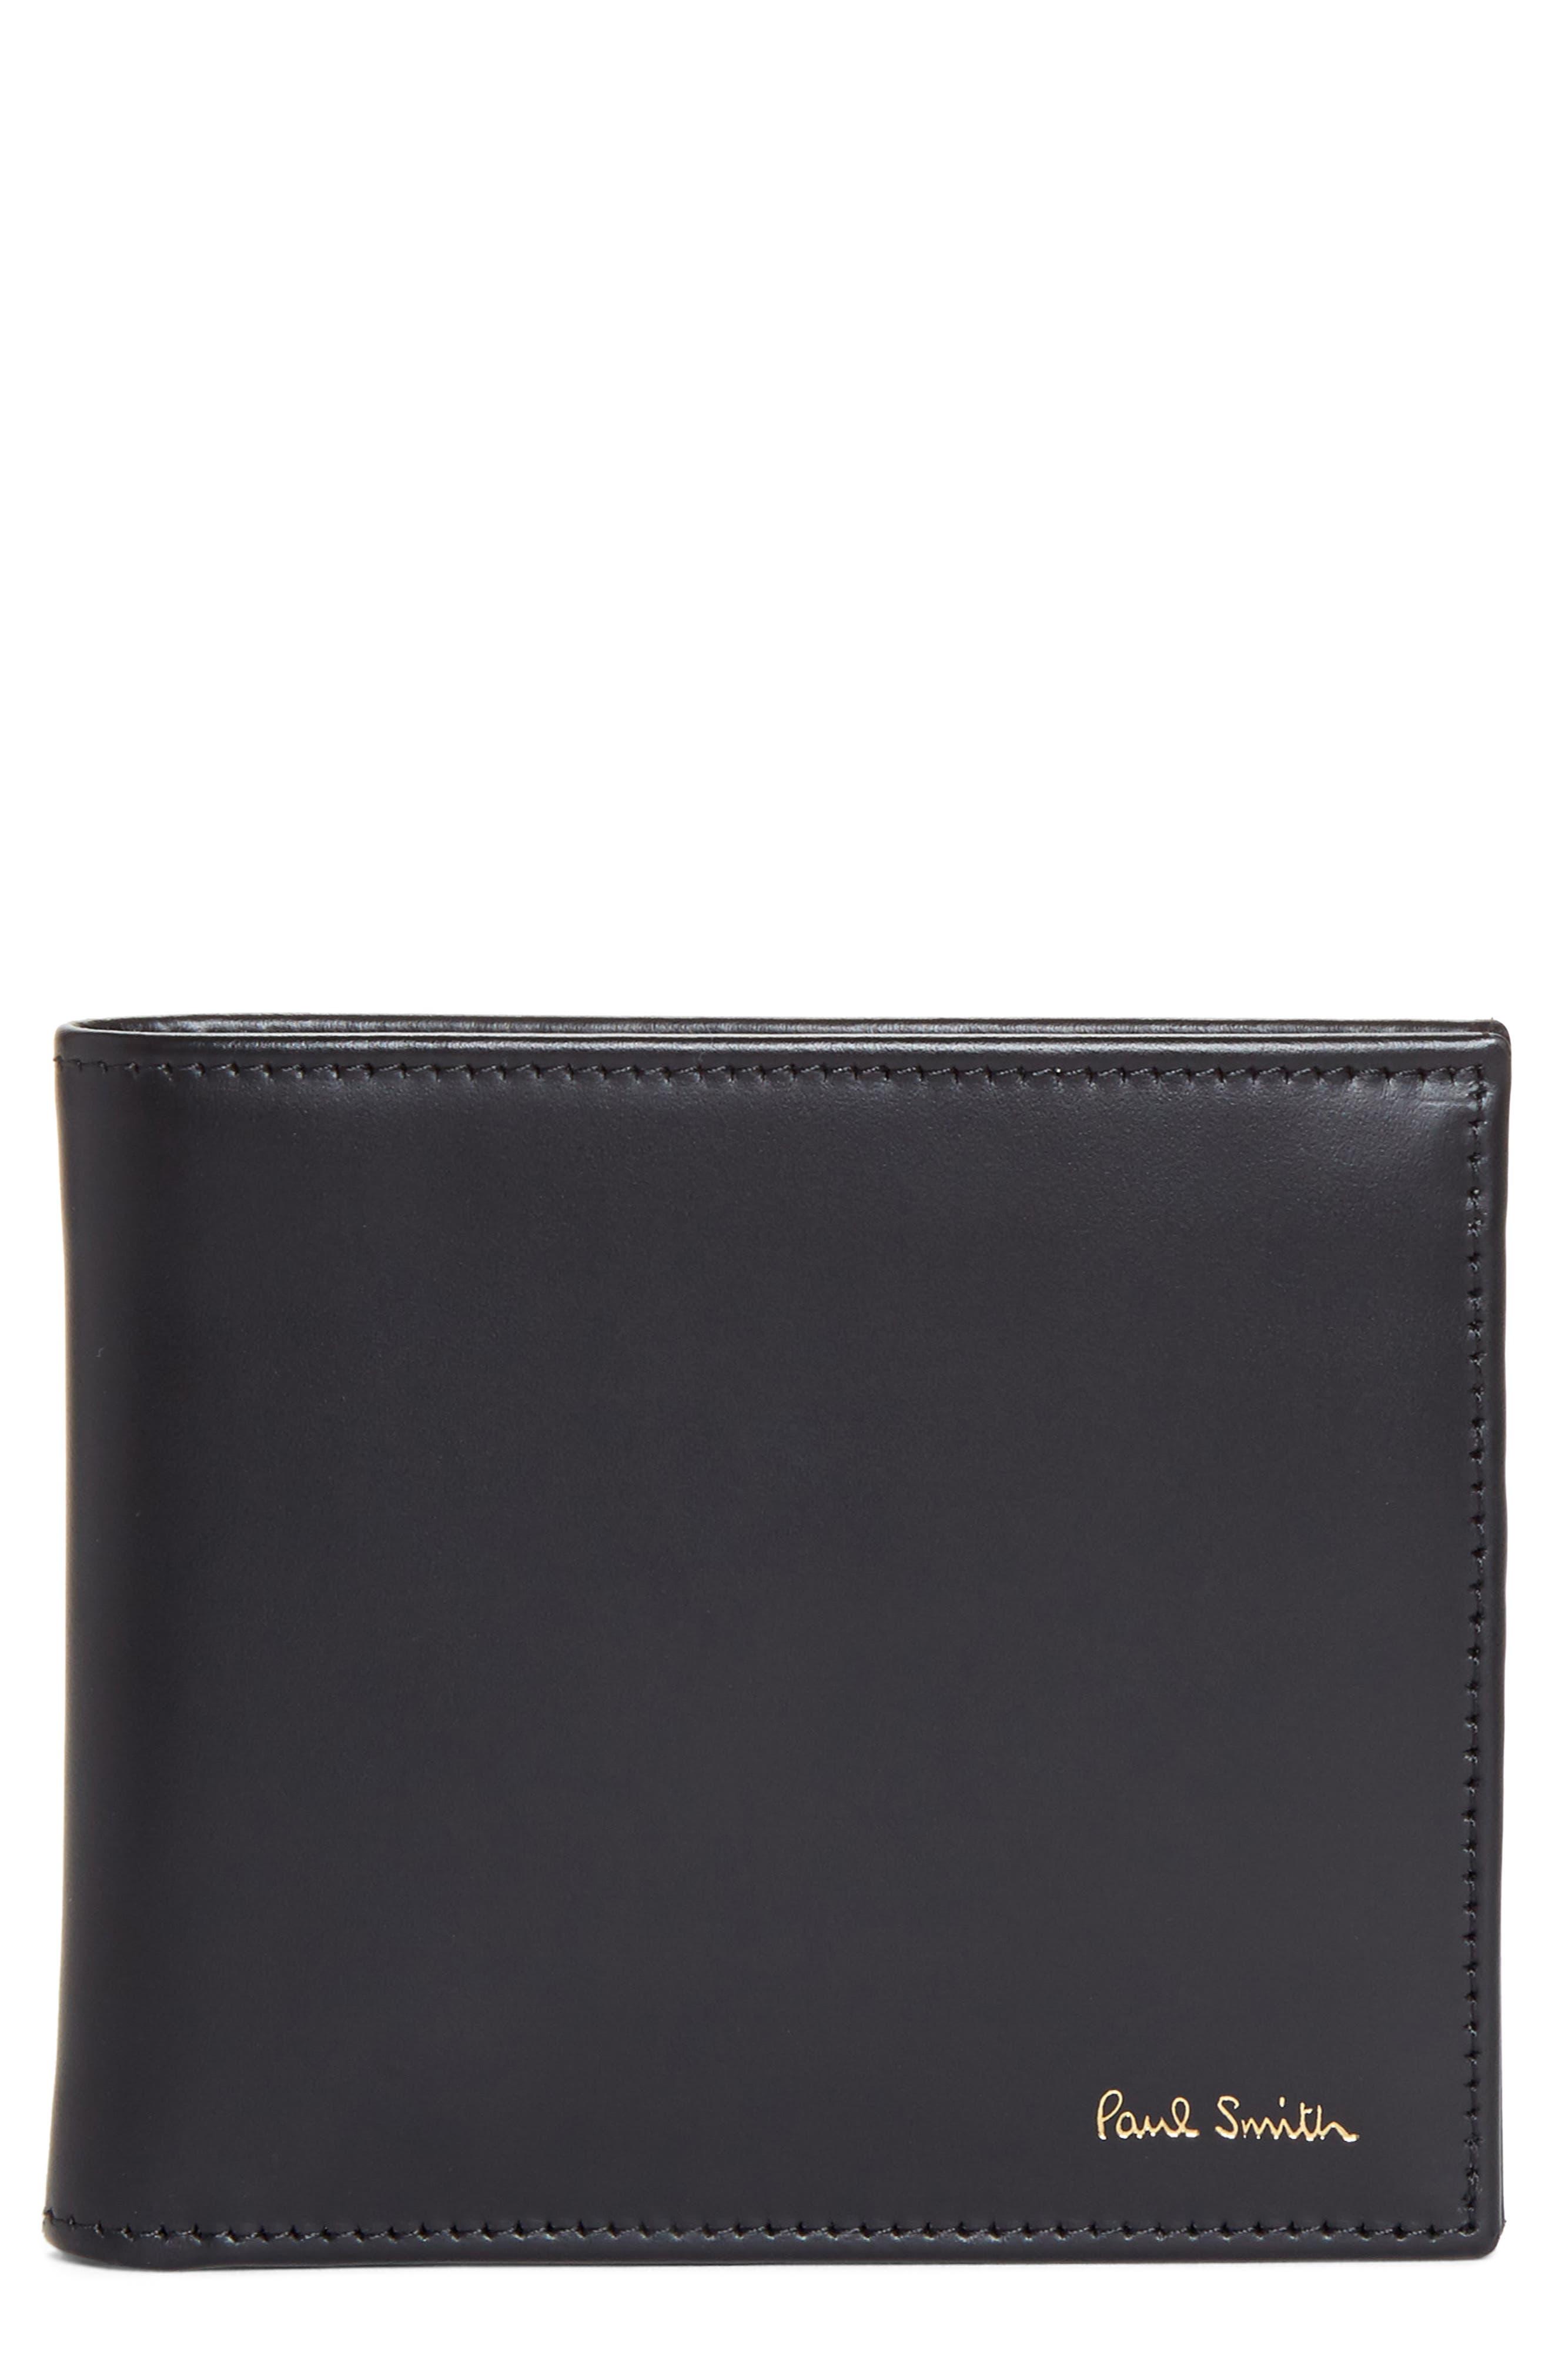 Multistripe Leather Wallet,                         Main,                         color, Black